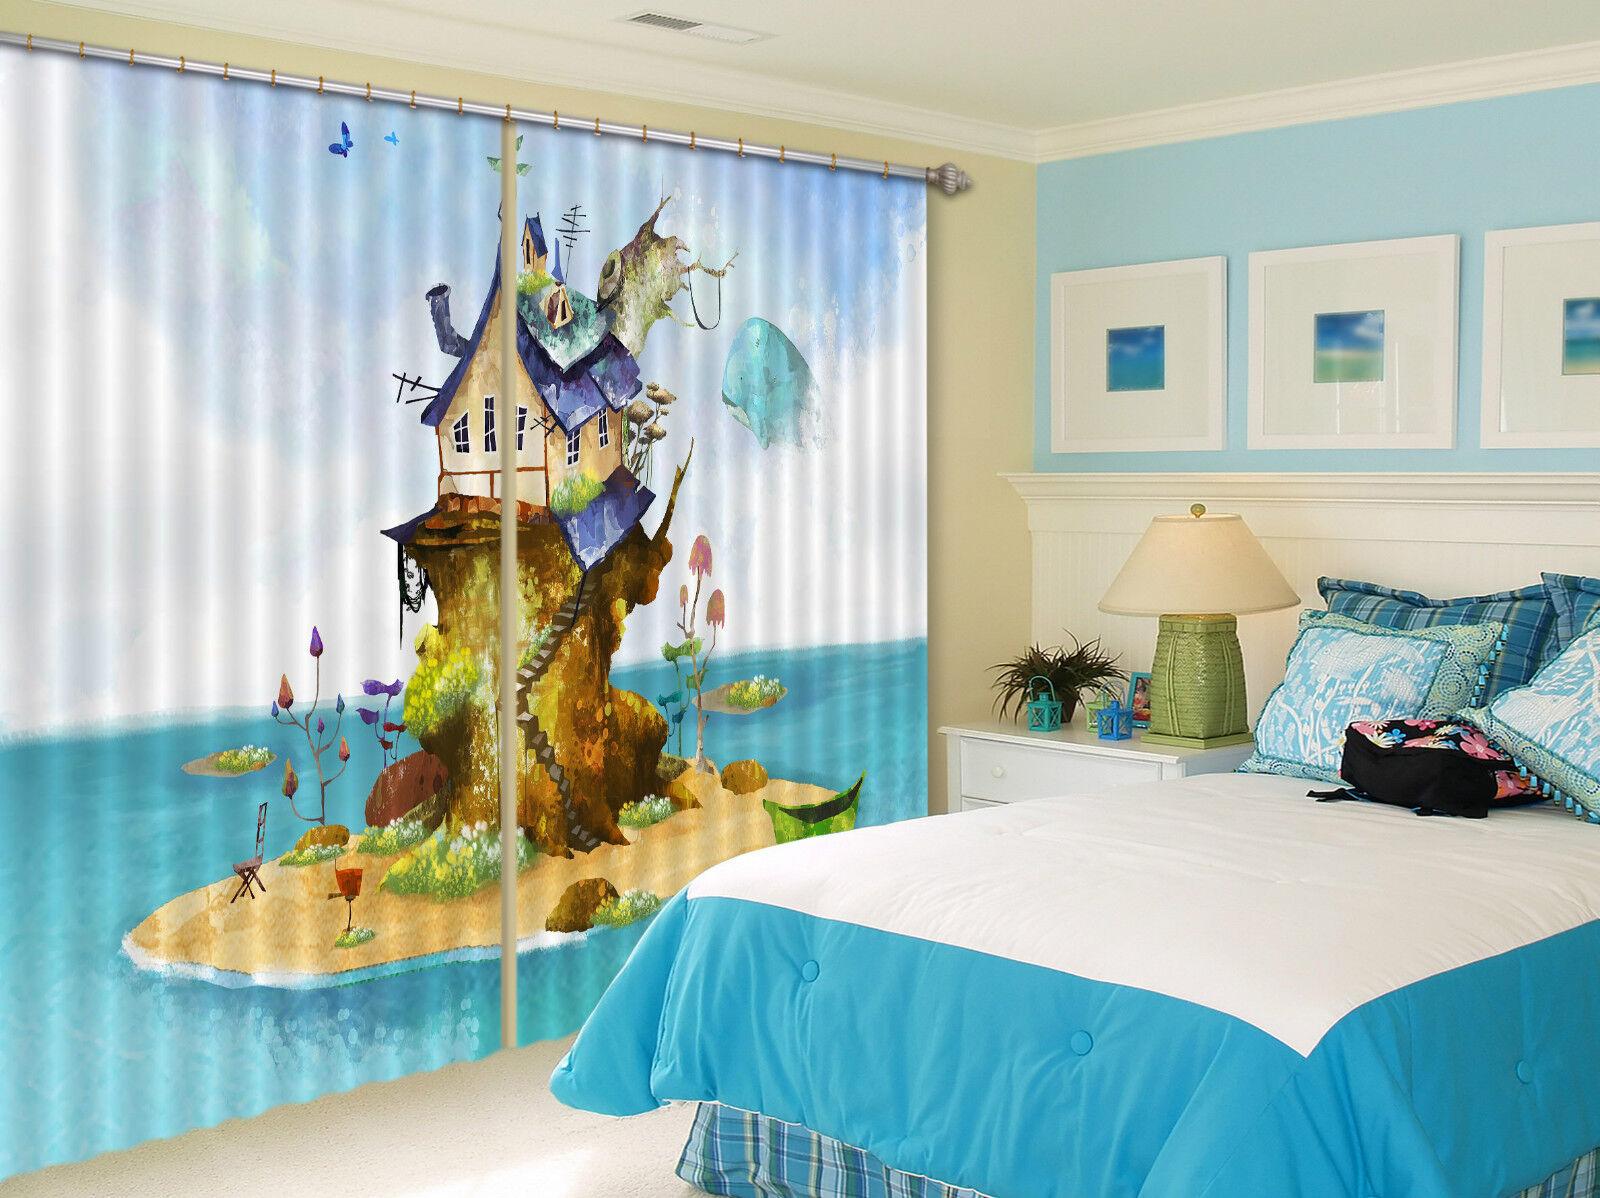 3d isla casa 657 bloqueo foto cortina cortina de impresión sustancia cortinas de ventana